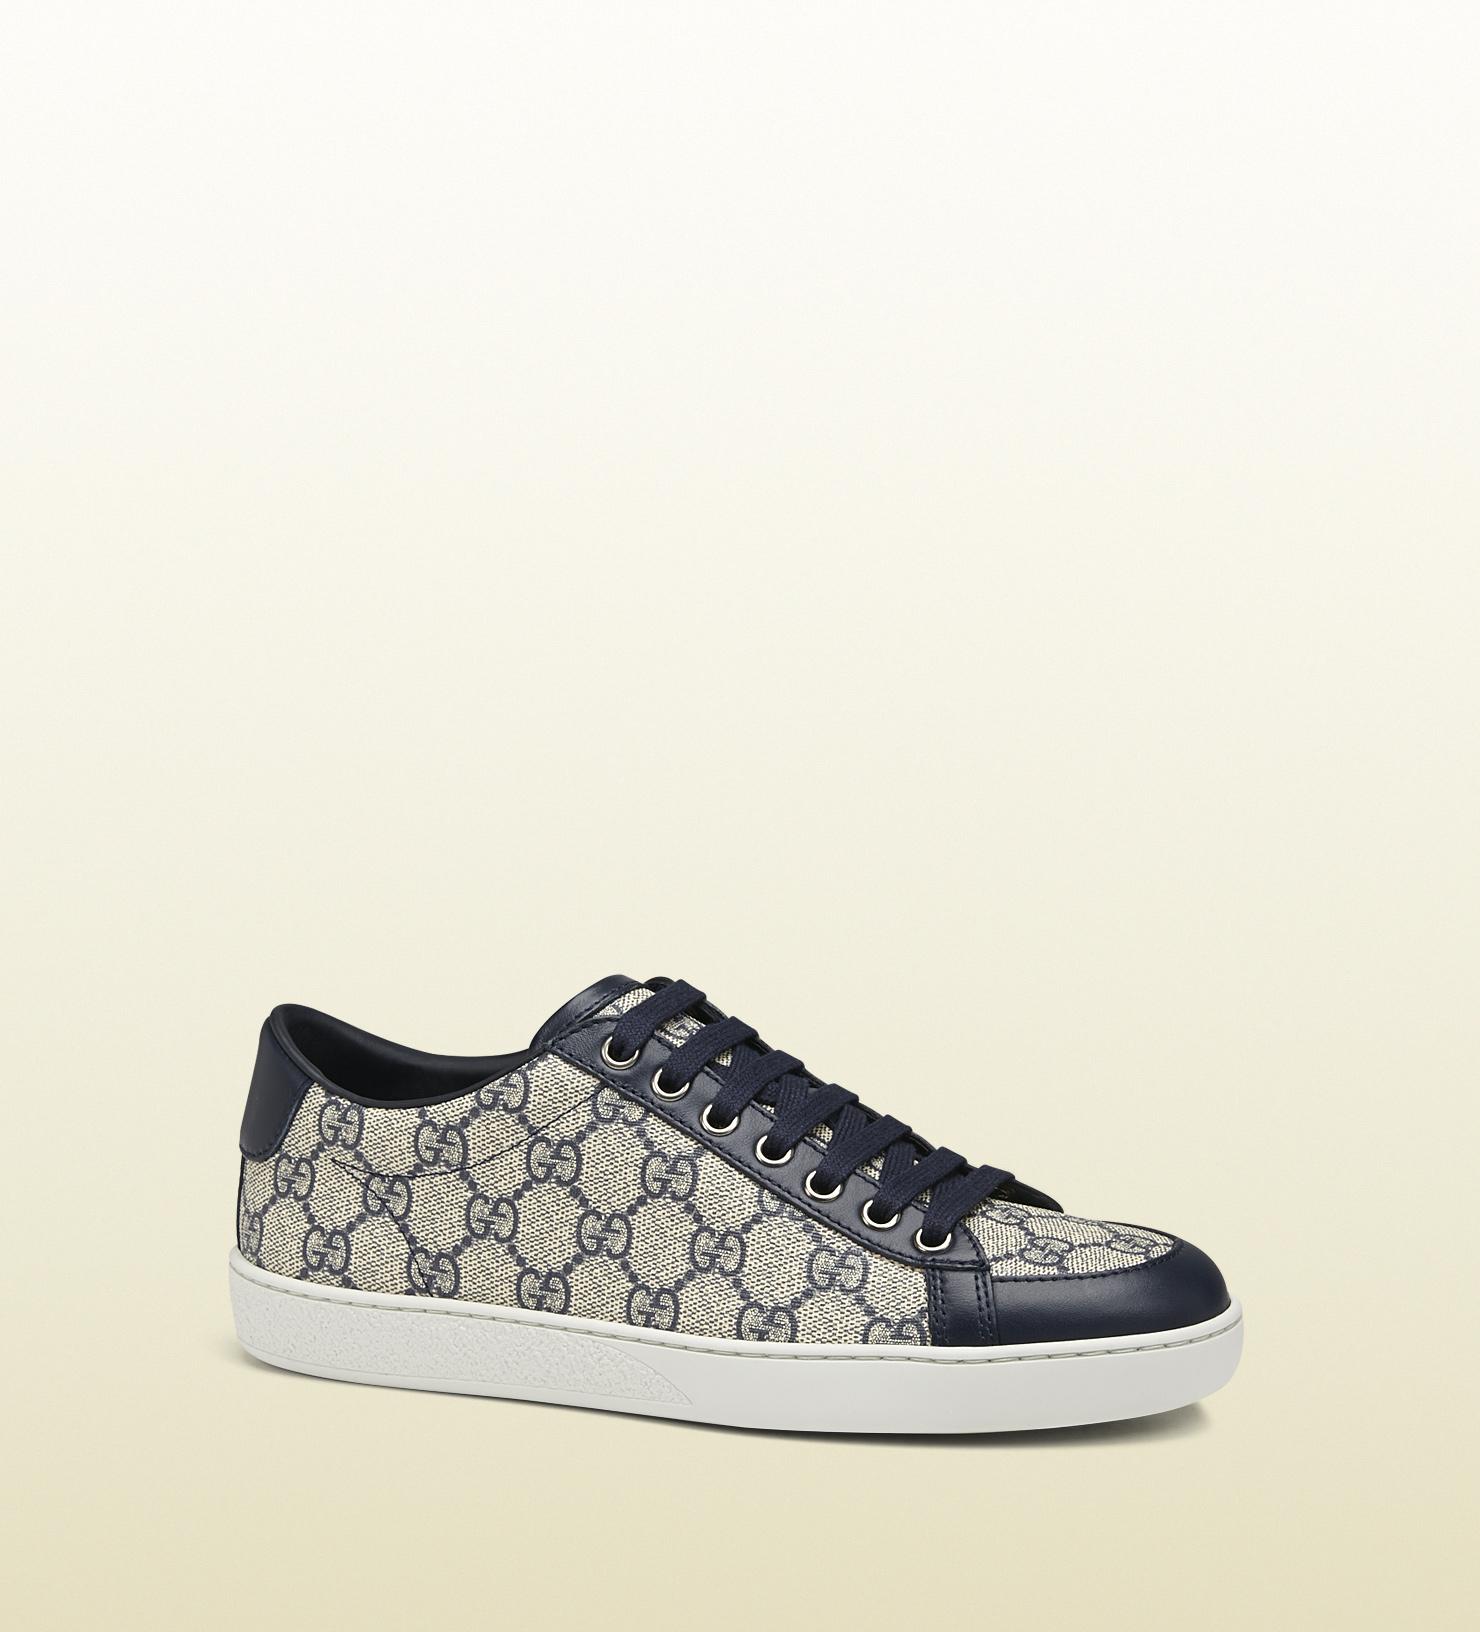 c20bf29c95f Gucci Brooklyn Gg Supreme Canvas Sneaker in Black for Men - Lyst